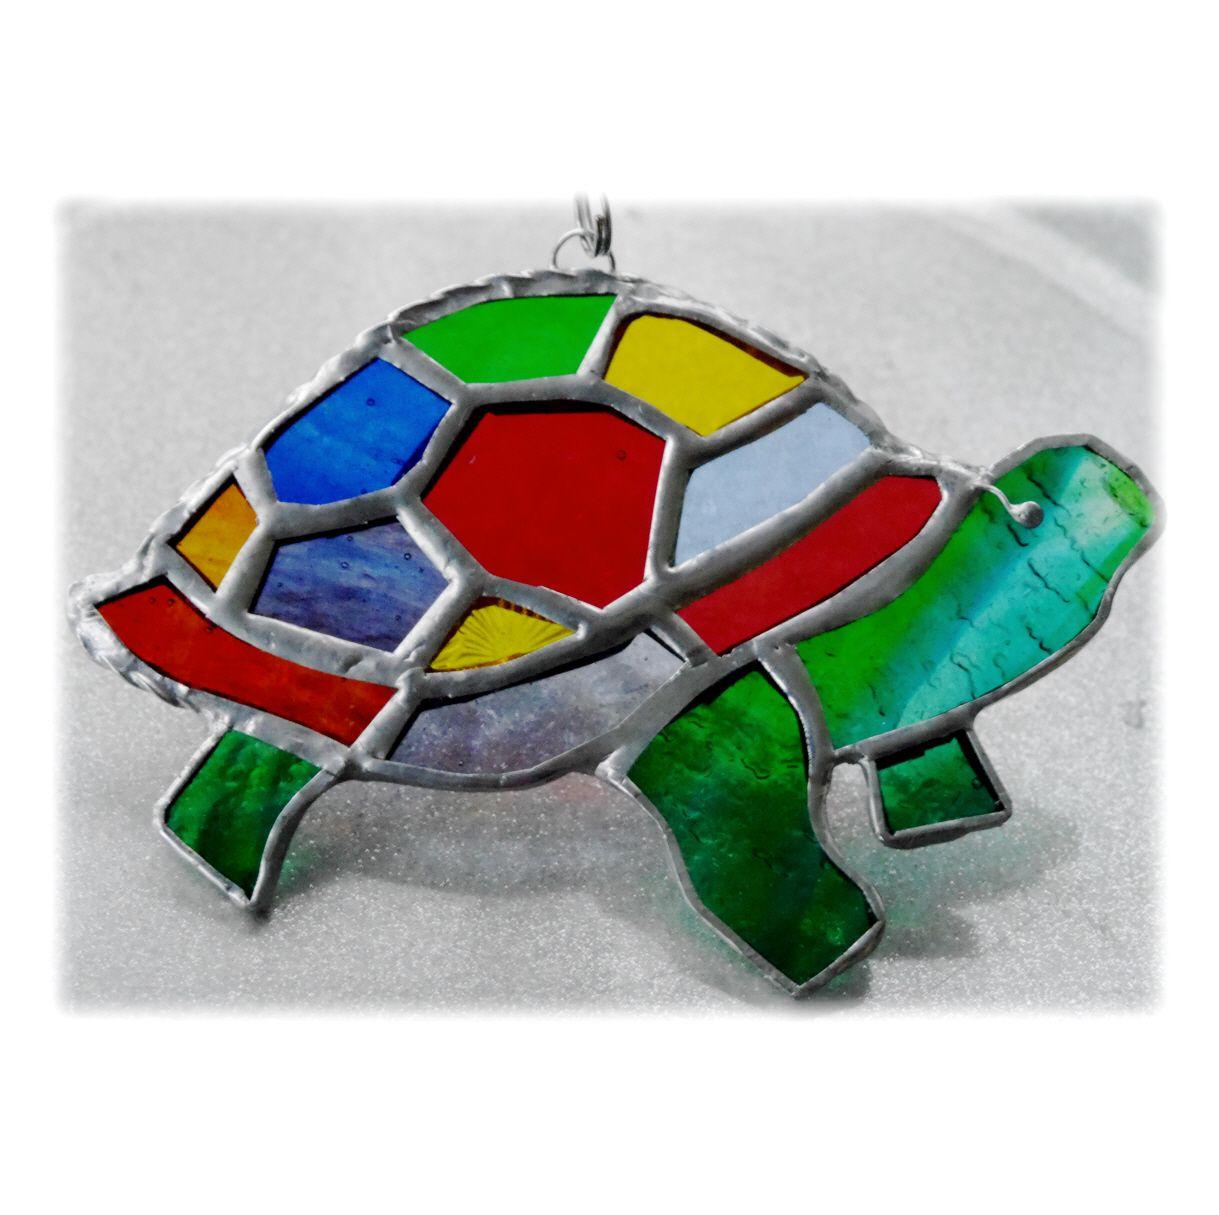 Turtle 025 #1901 FREE 14.50